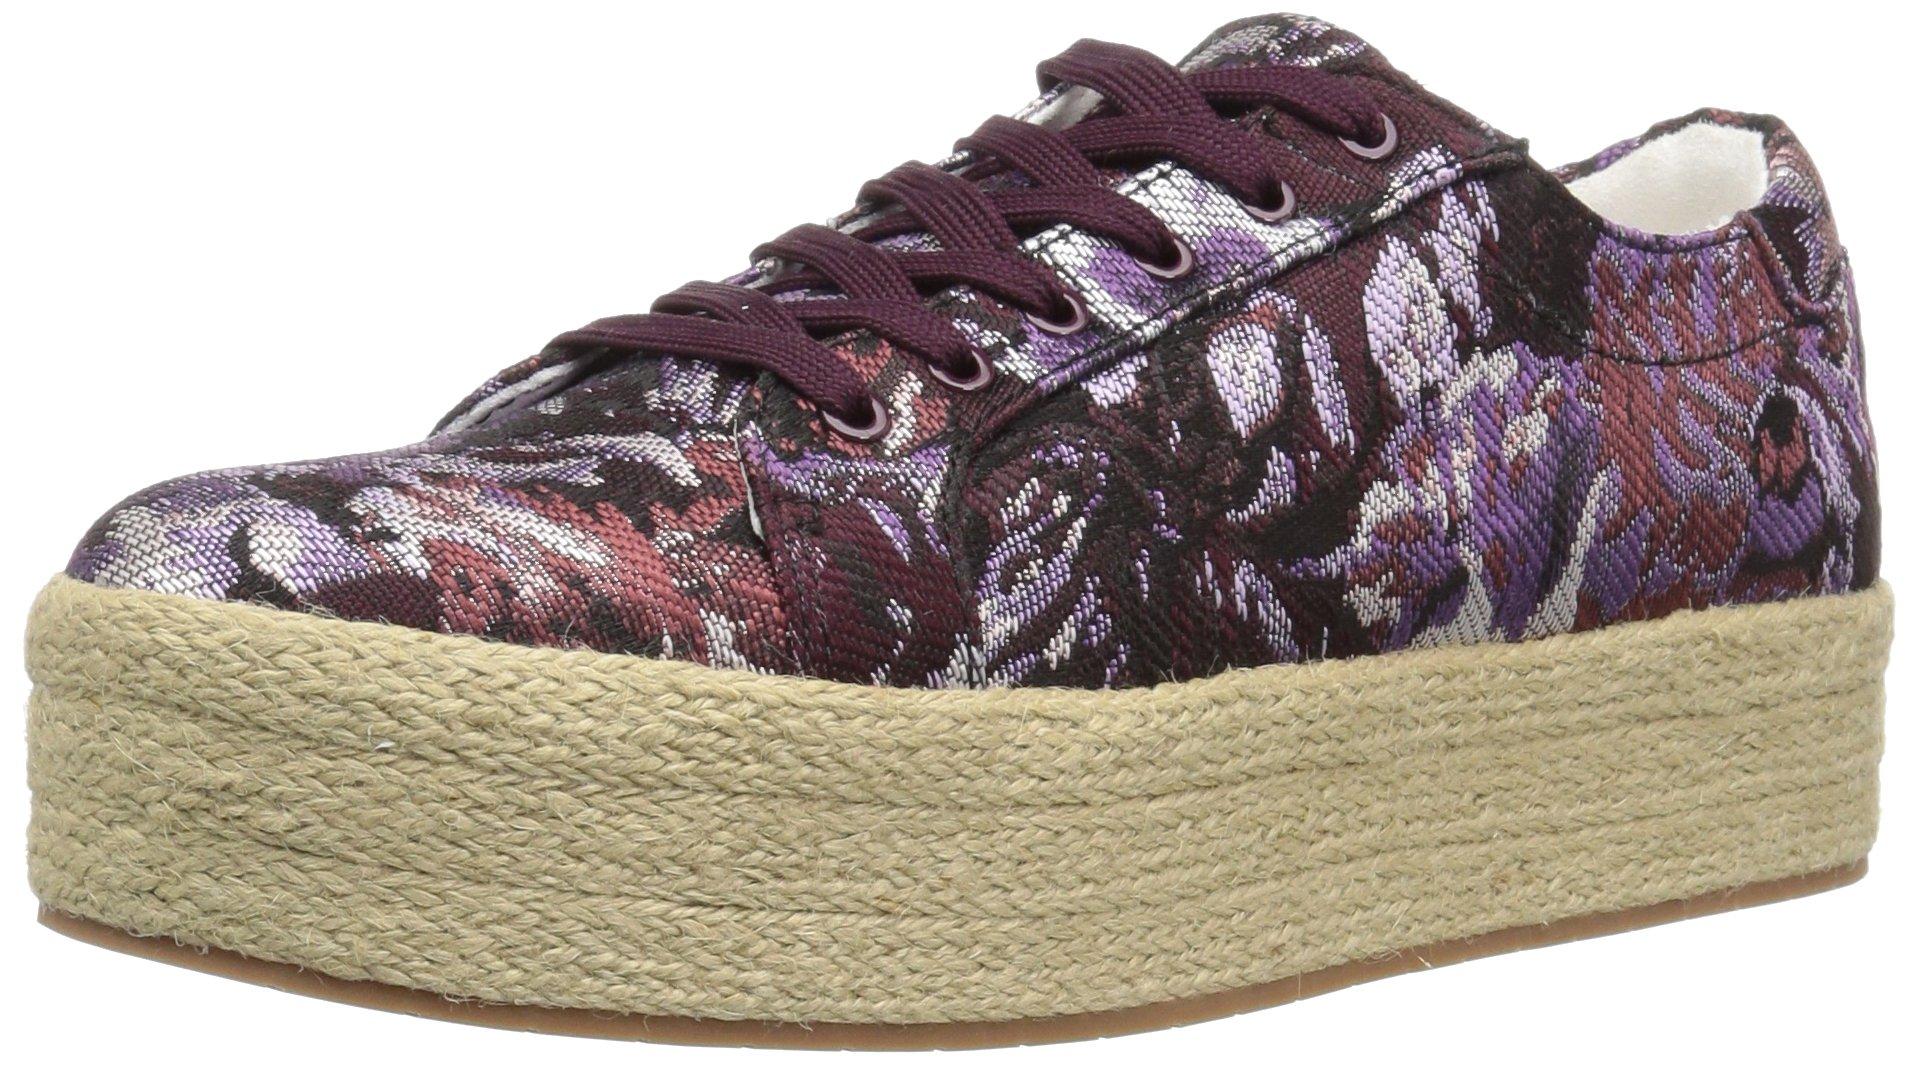 Kenneth Cole New York Women's Allyson Platform Lace up Jute Wrap-Techni-Cole Sneaker, Purple/Multi, 10 Medium US